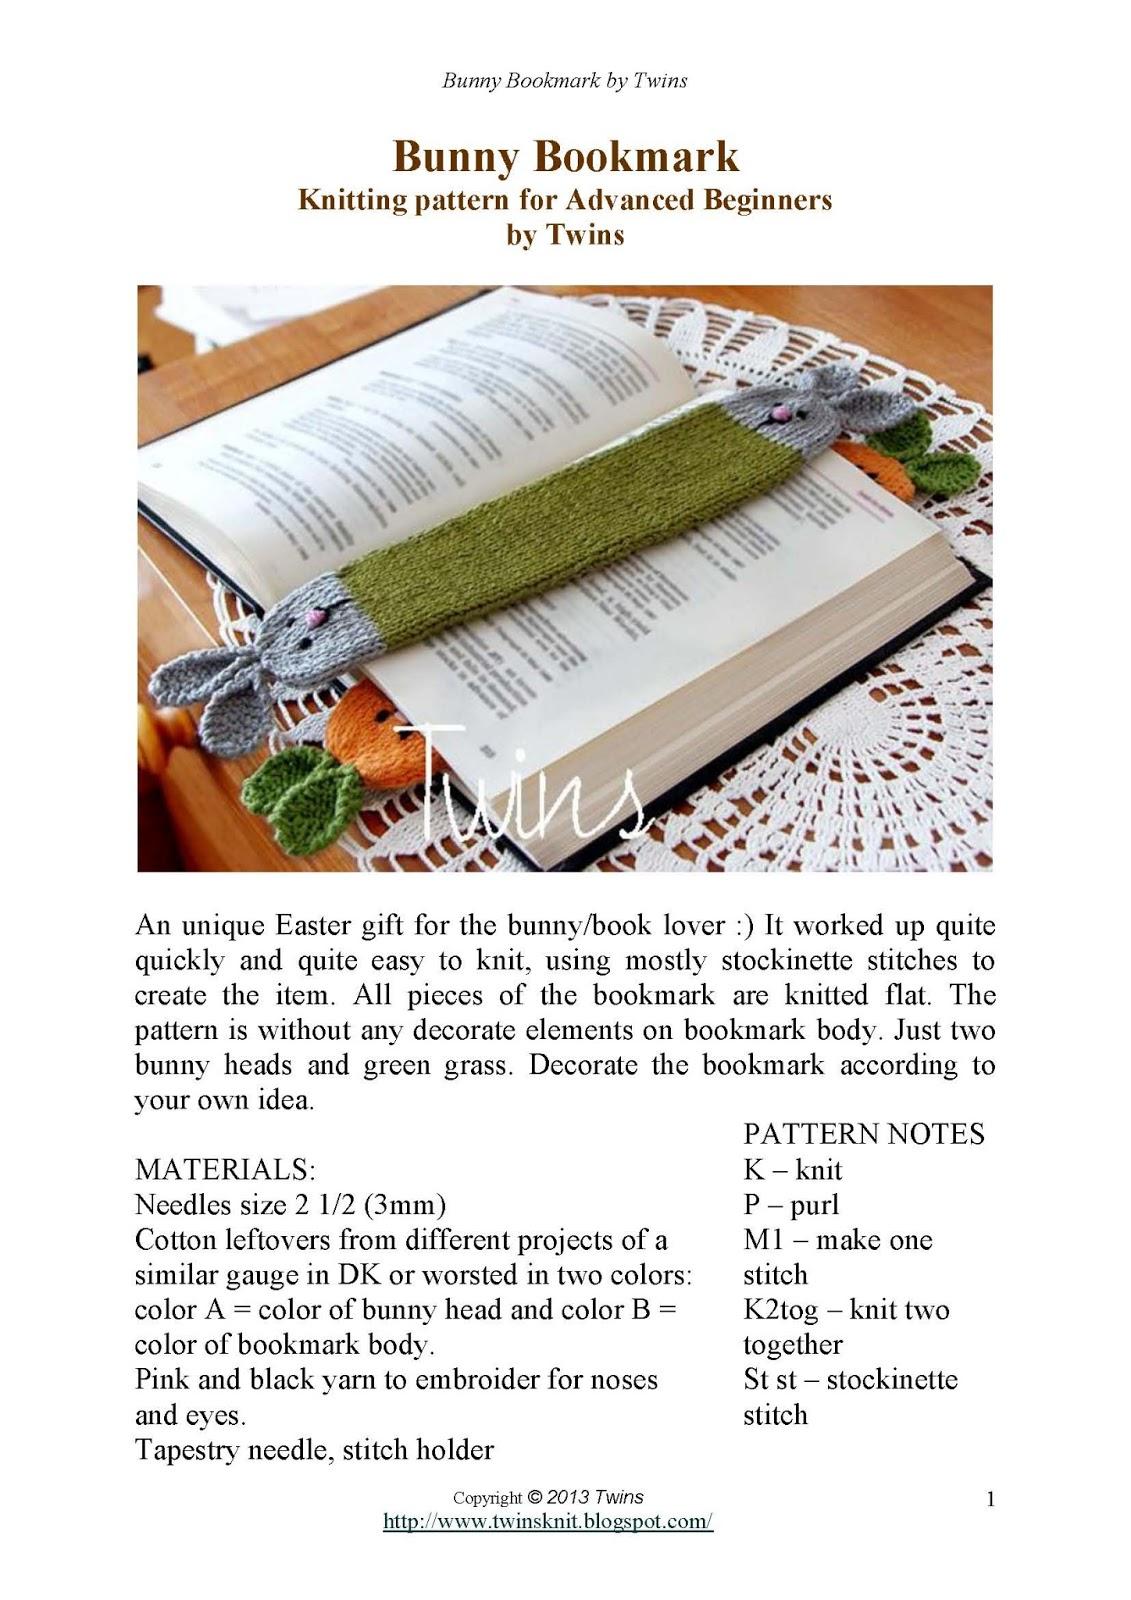 Knitting Patterns For Advanced Beginner : Twins Knitting Pattern MiniShop: Bunny Bookmark - free knitting pattern ...